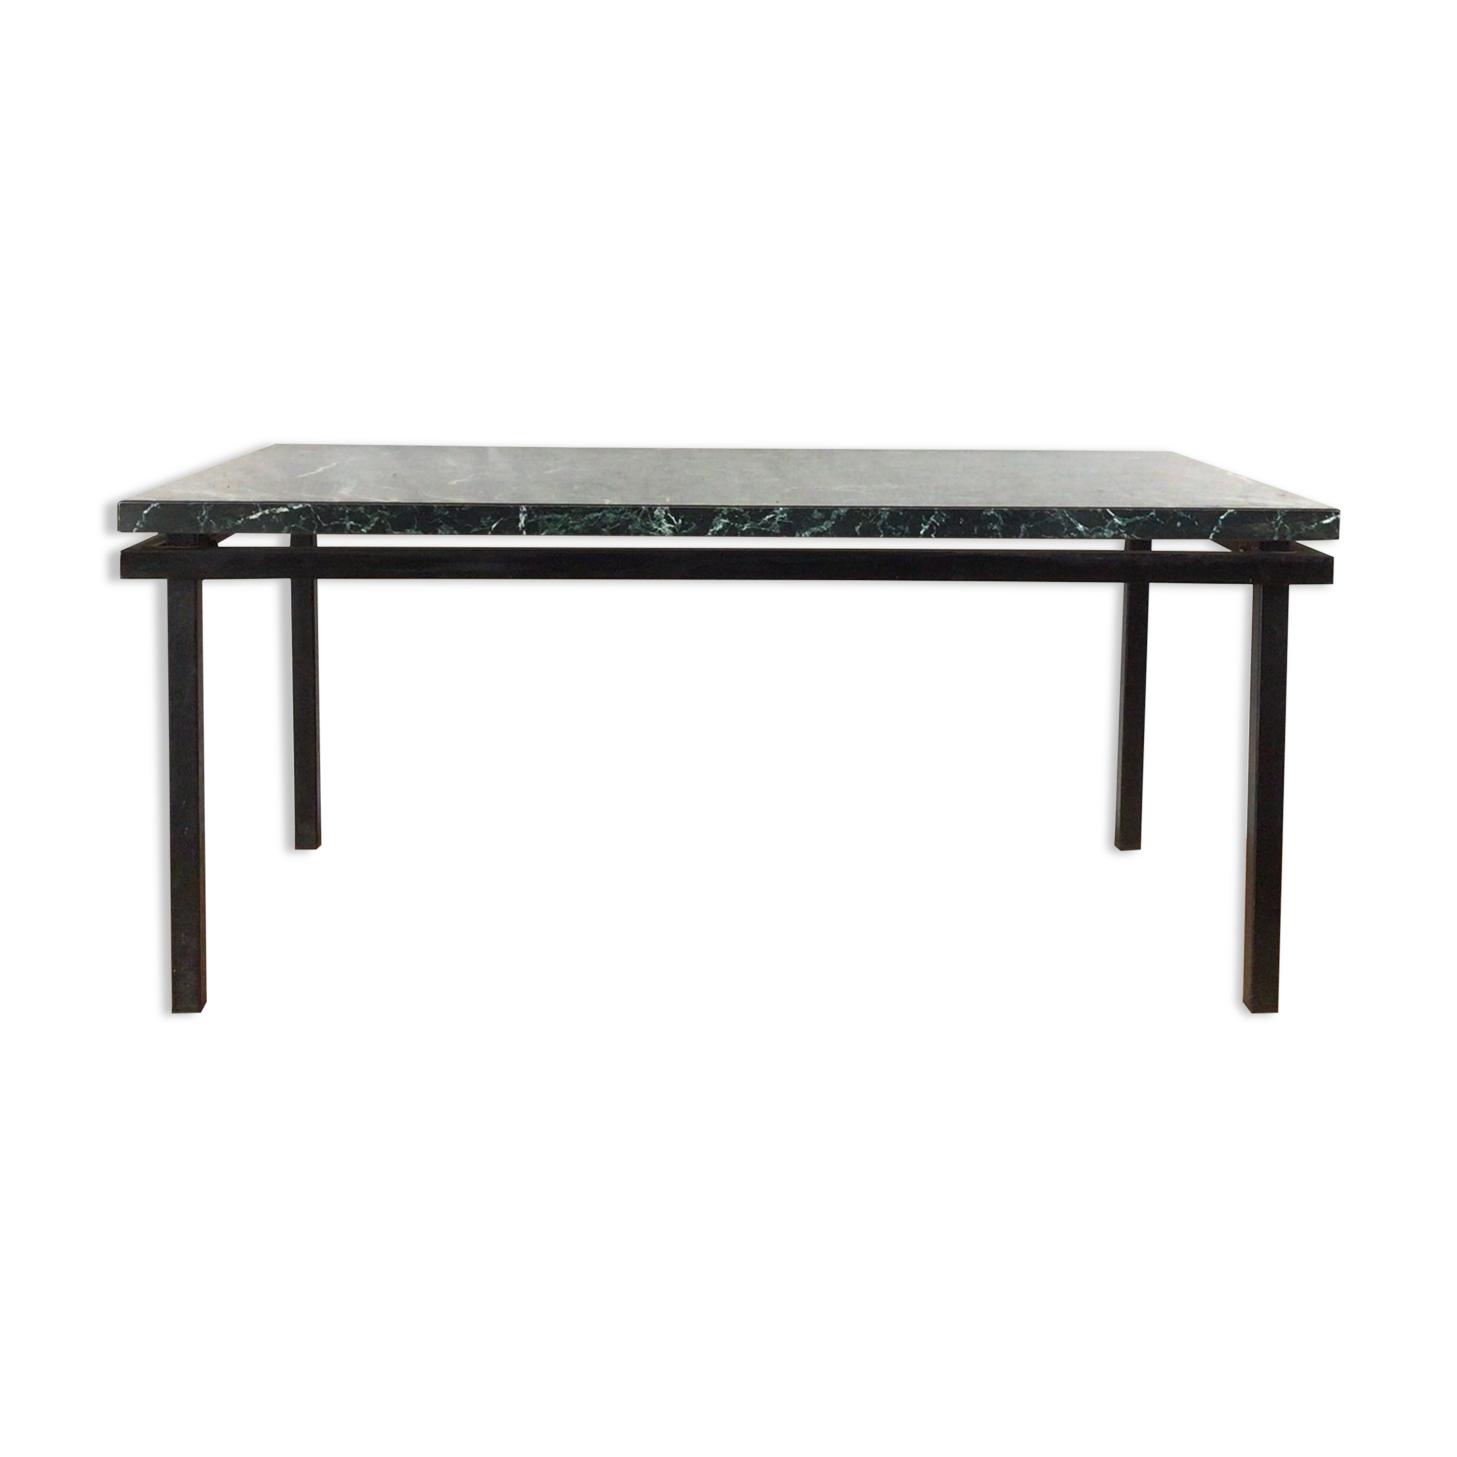 Table basse formica imitation marbre